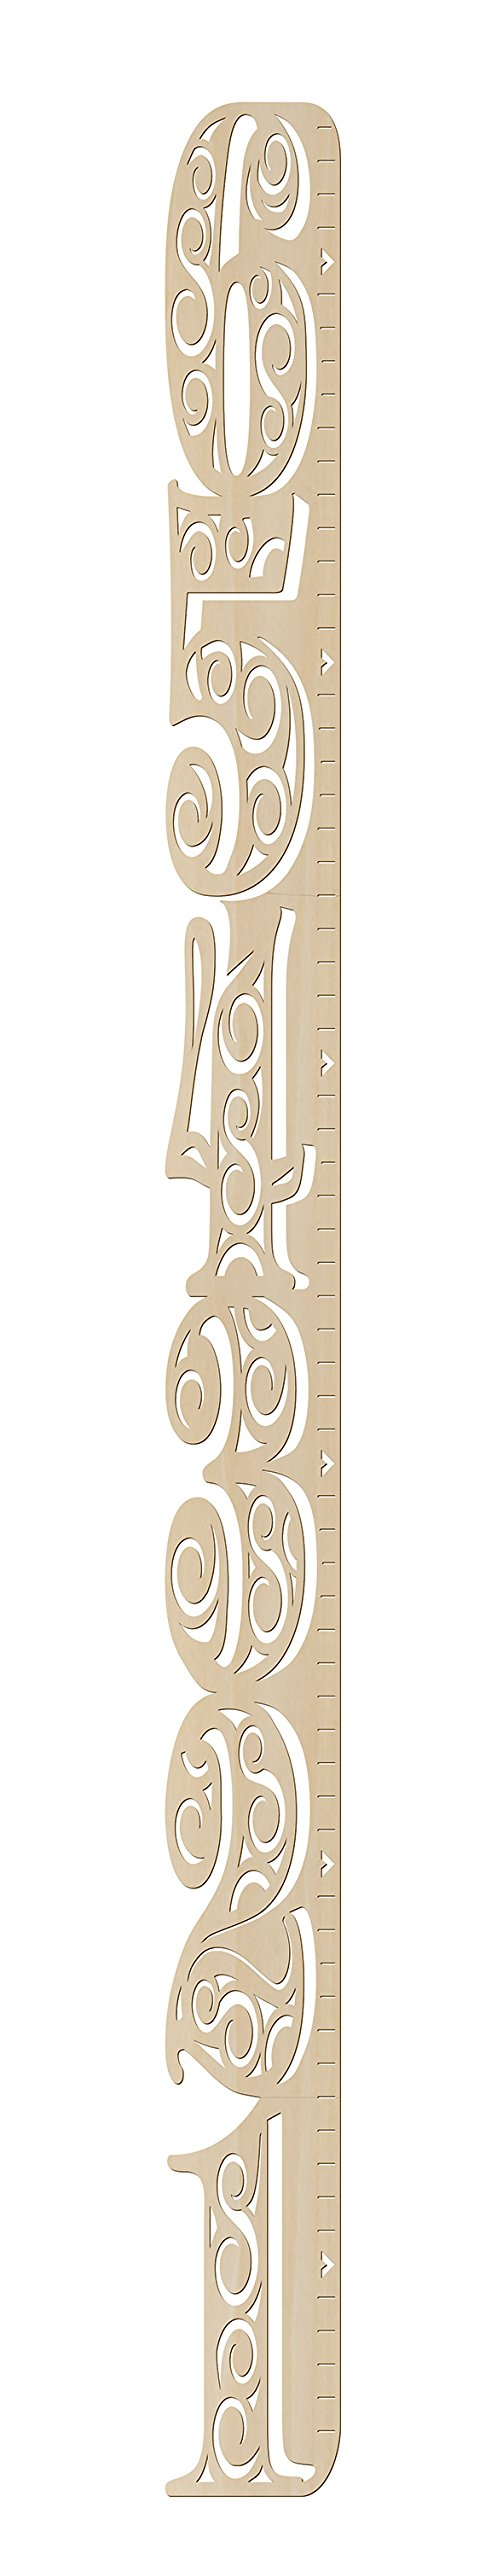 DIY Wooden Swirls Growth Chart